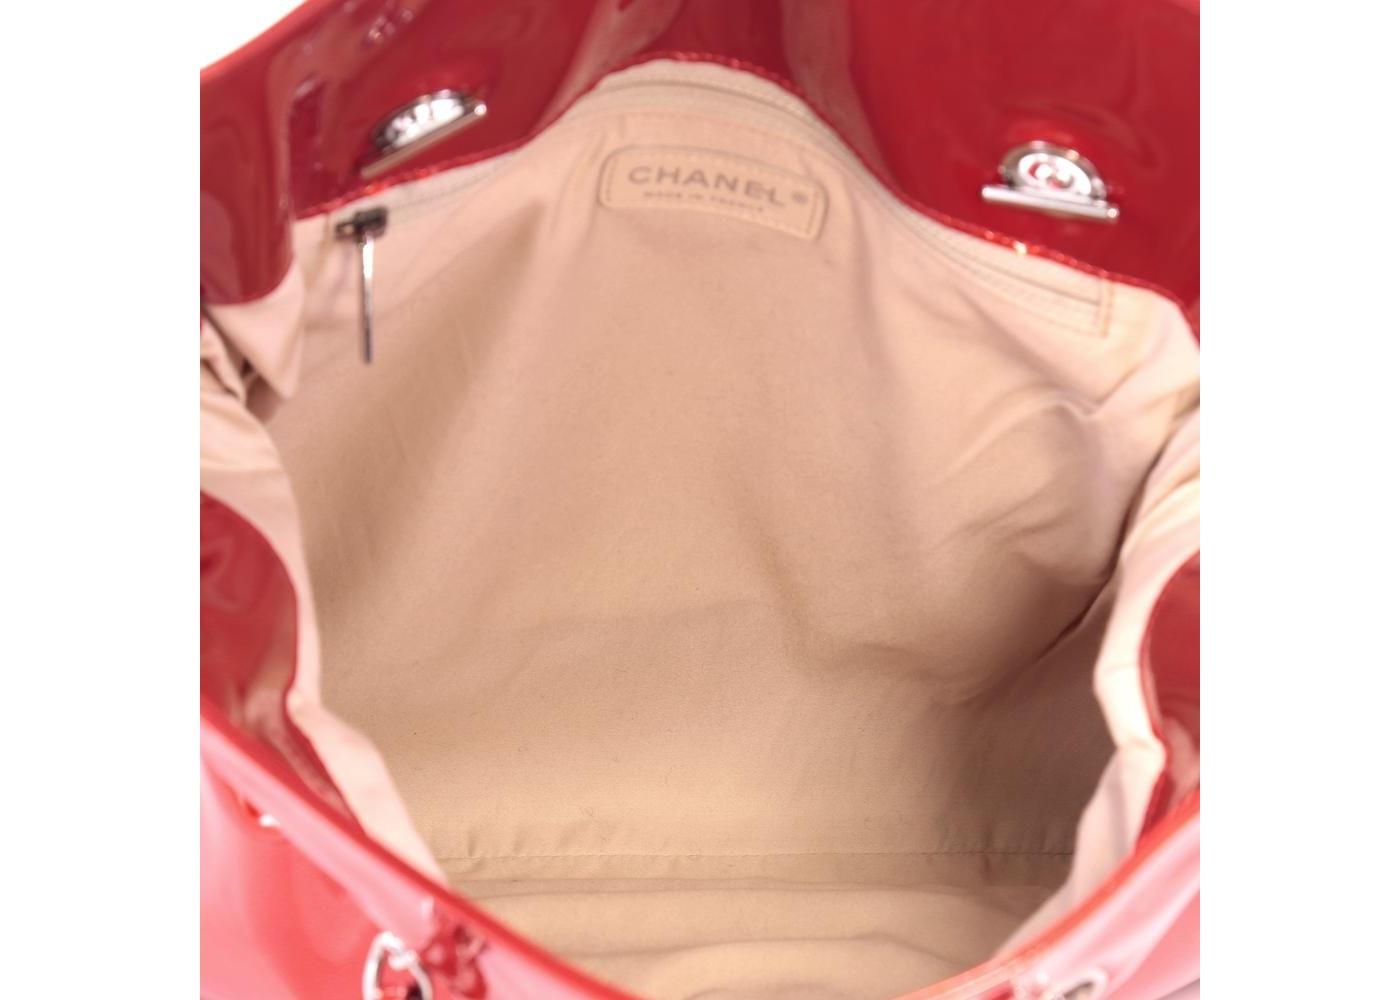 5a8a8381cccf Chanel Bon Bon Tote Embellished Large Red